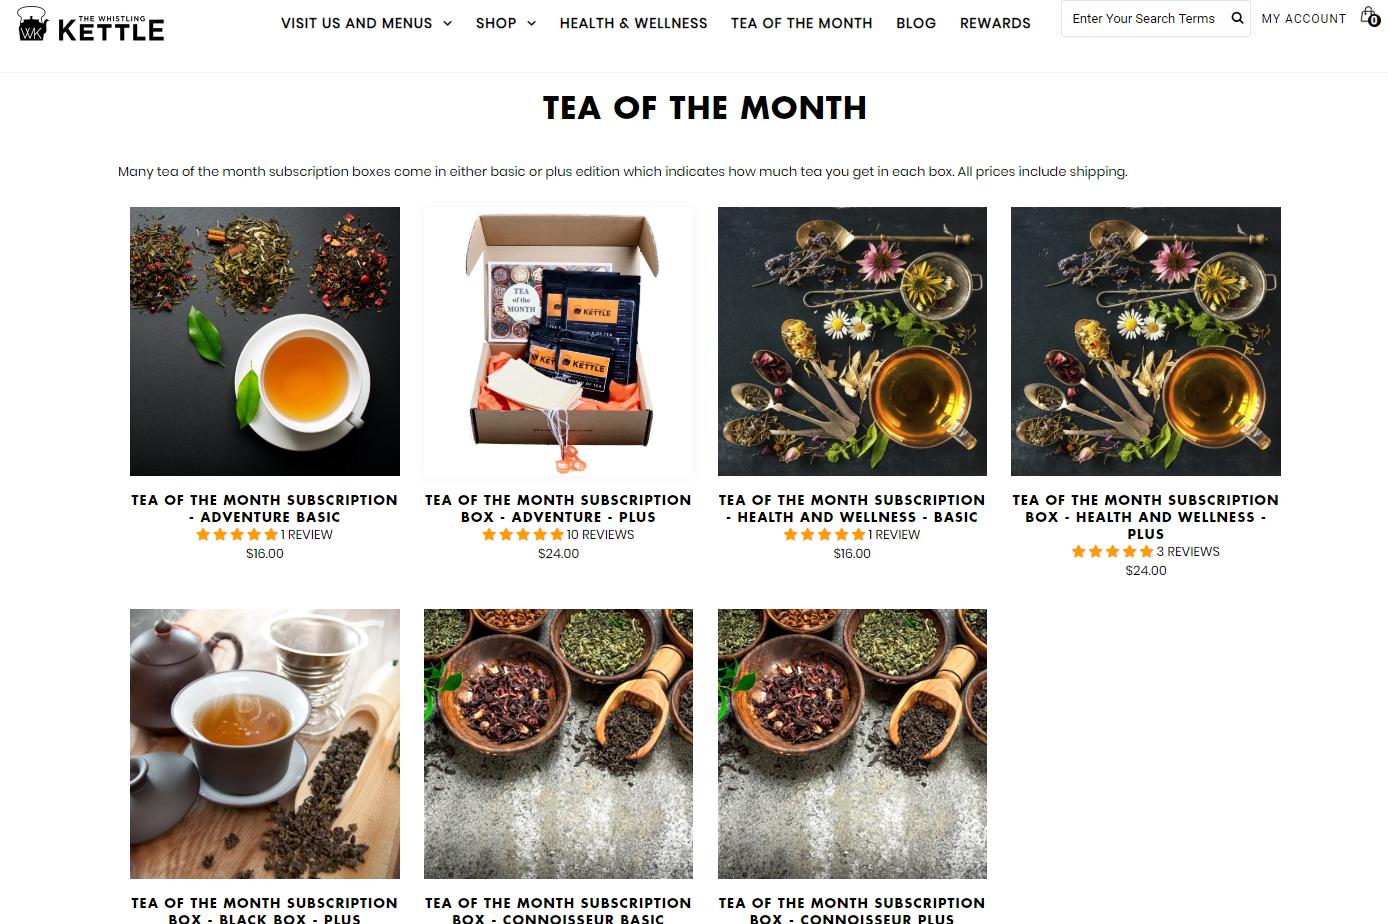 The Whistling Kettle black tea green tea herbal tea adventure tea health and wellness tea